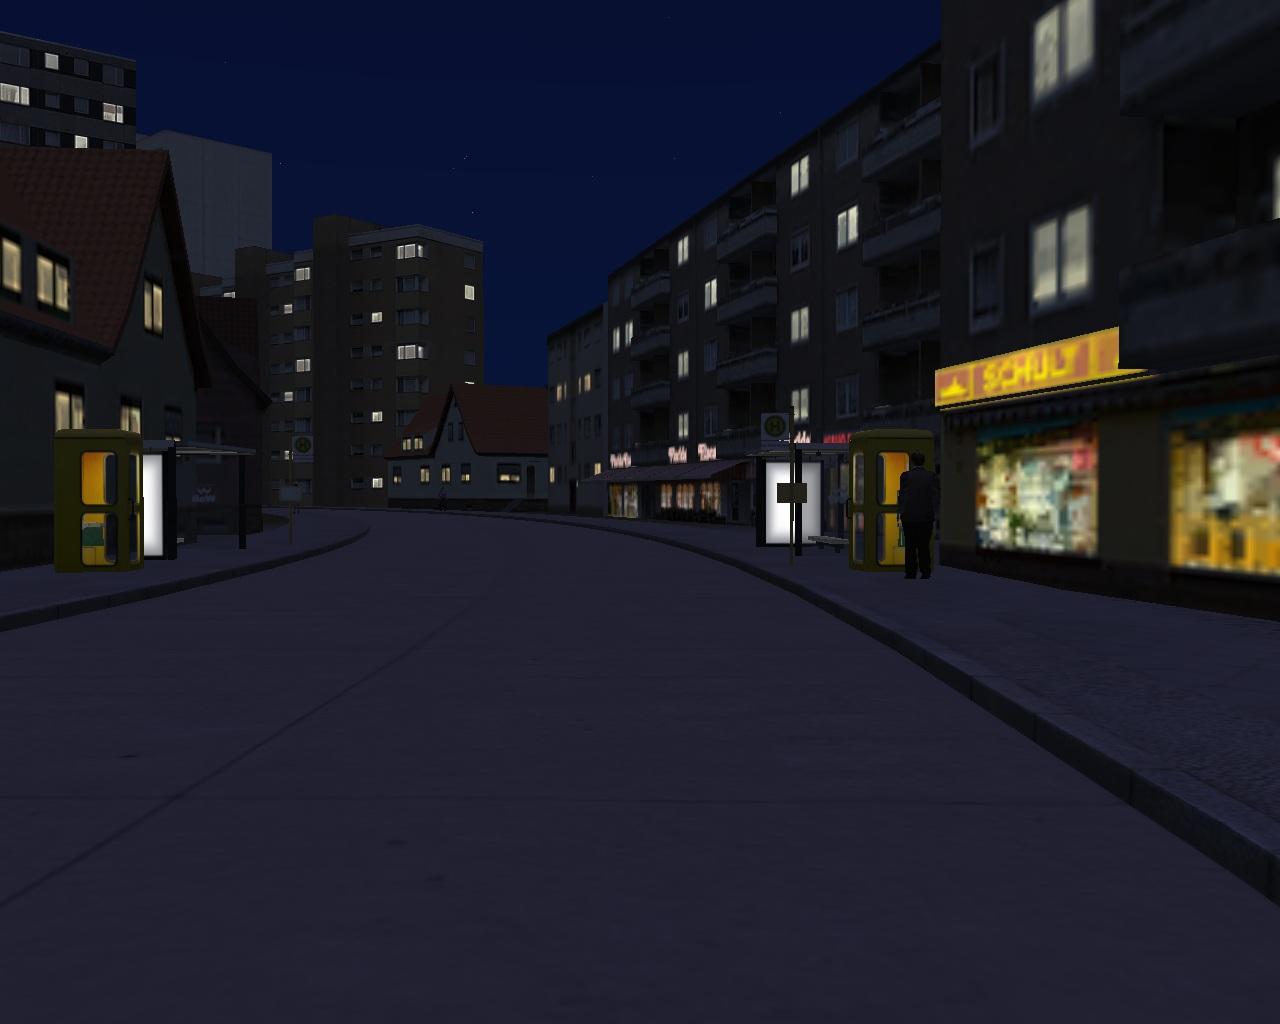 Friesenburg Friesenburg2vl2z